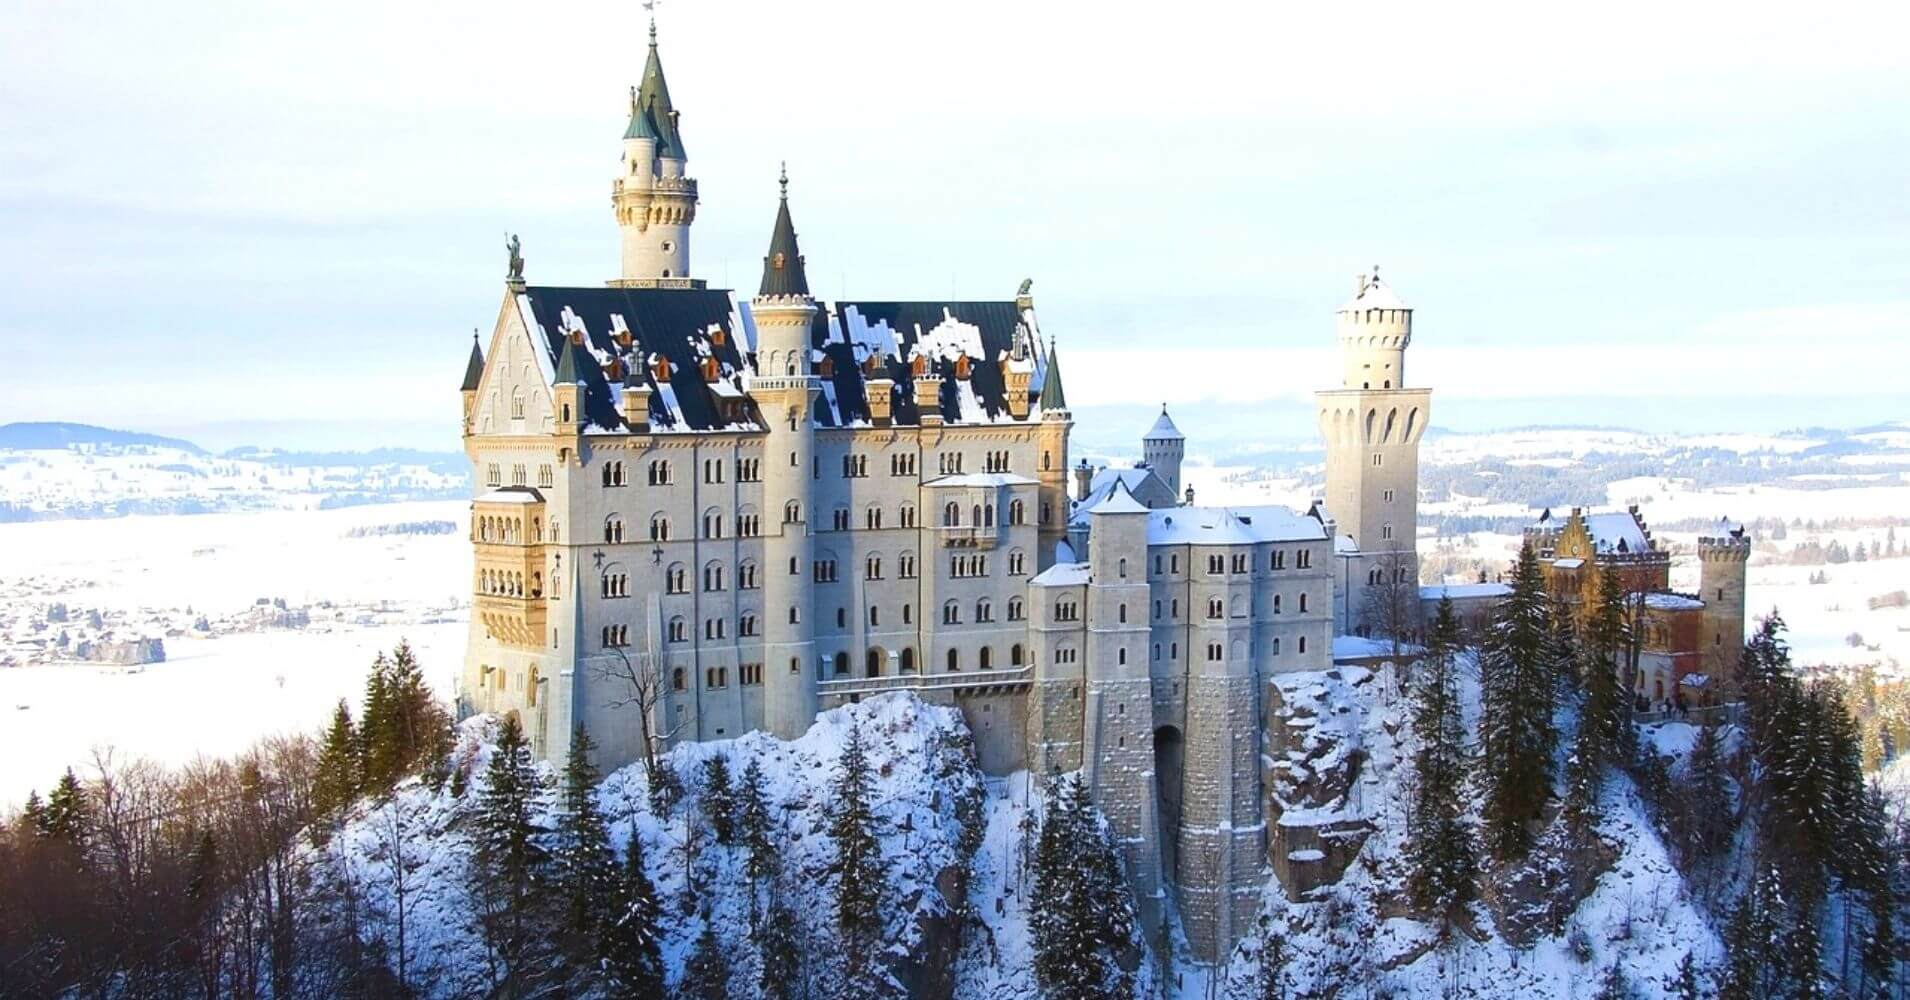 Castillo de Neuschwanstein. Baviera en Alemania.